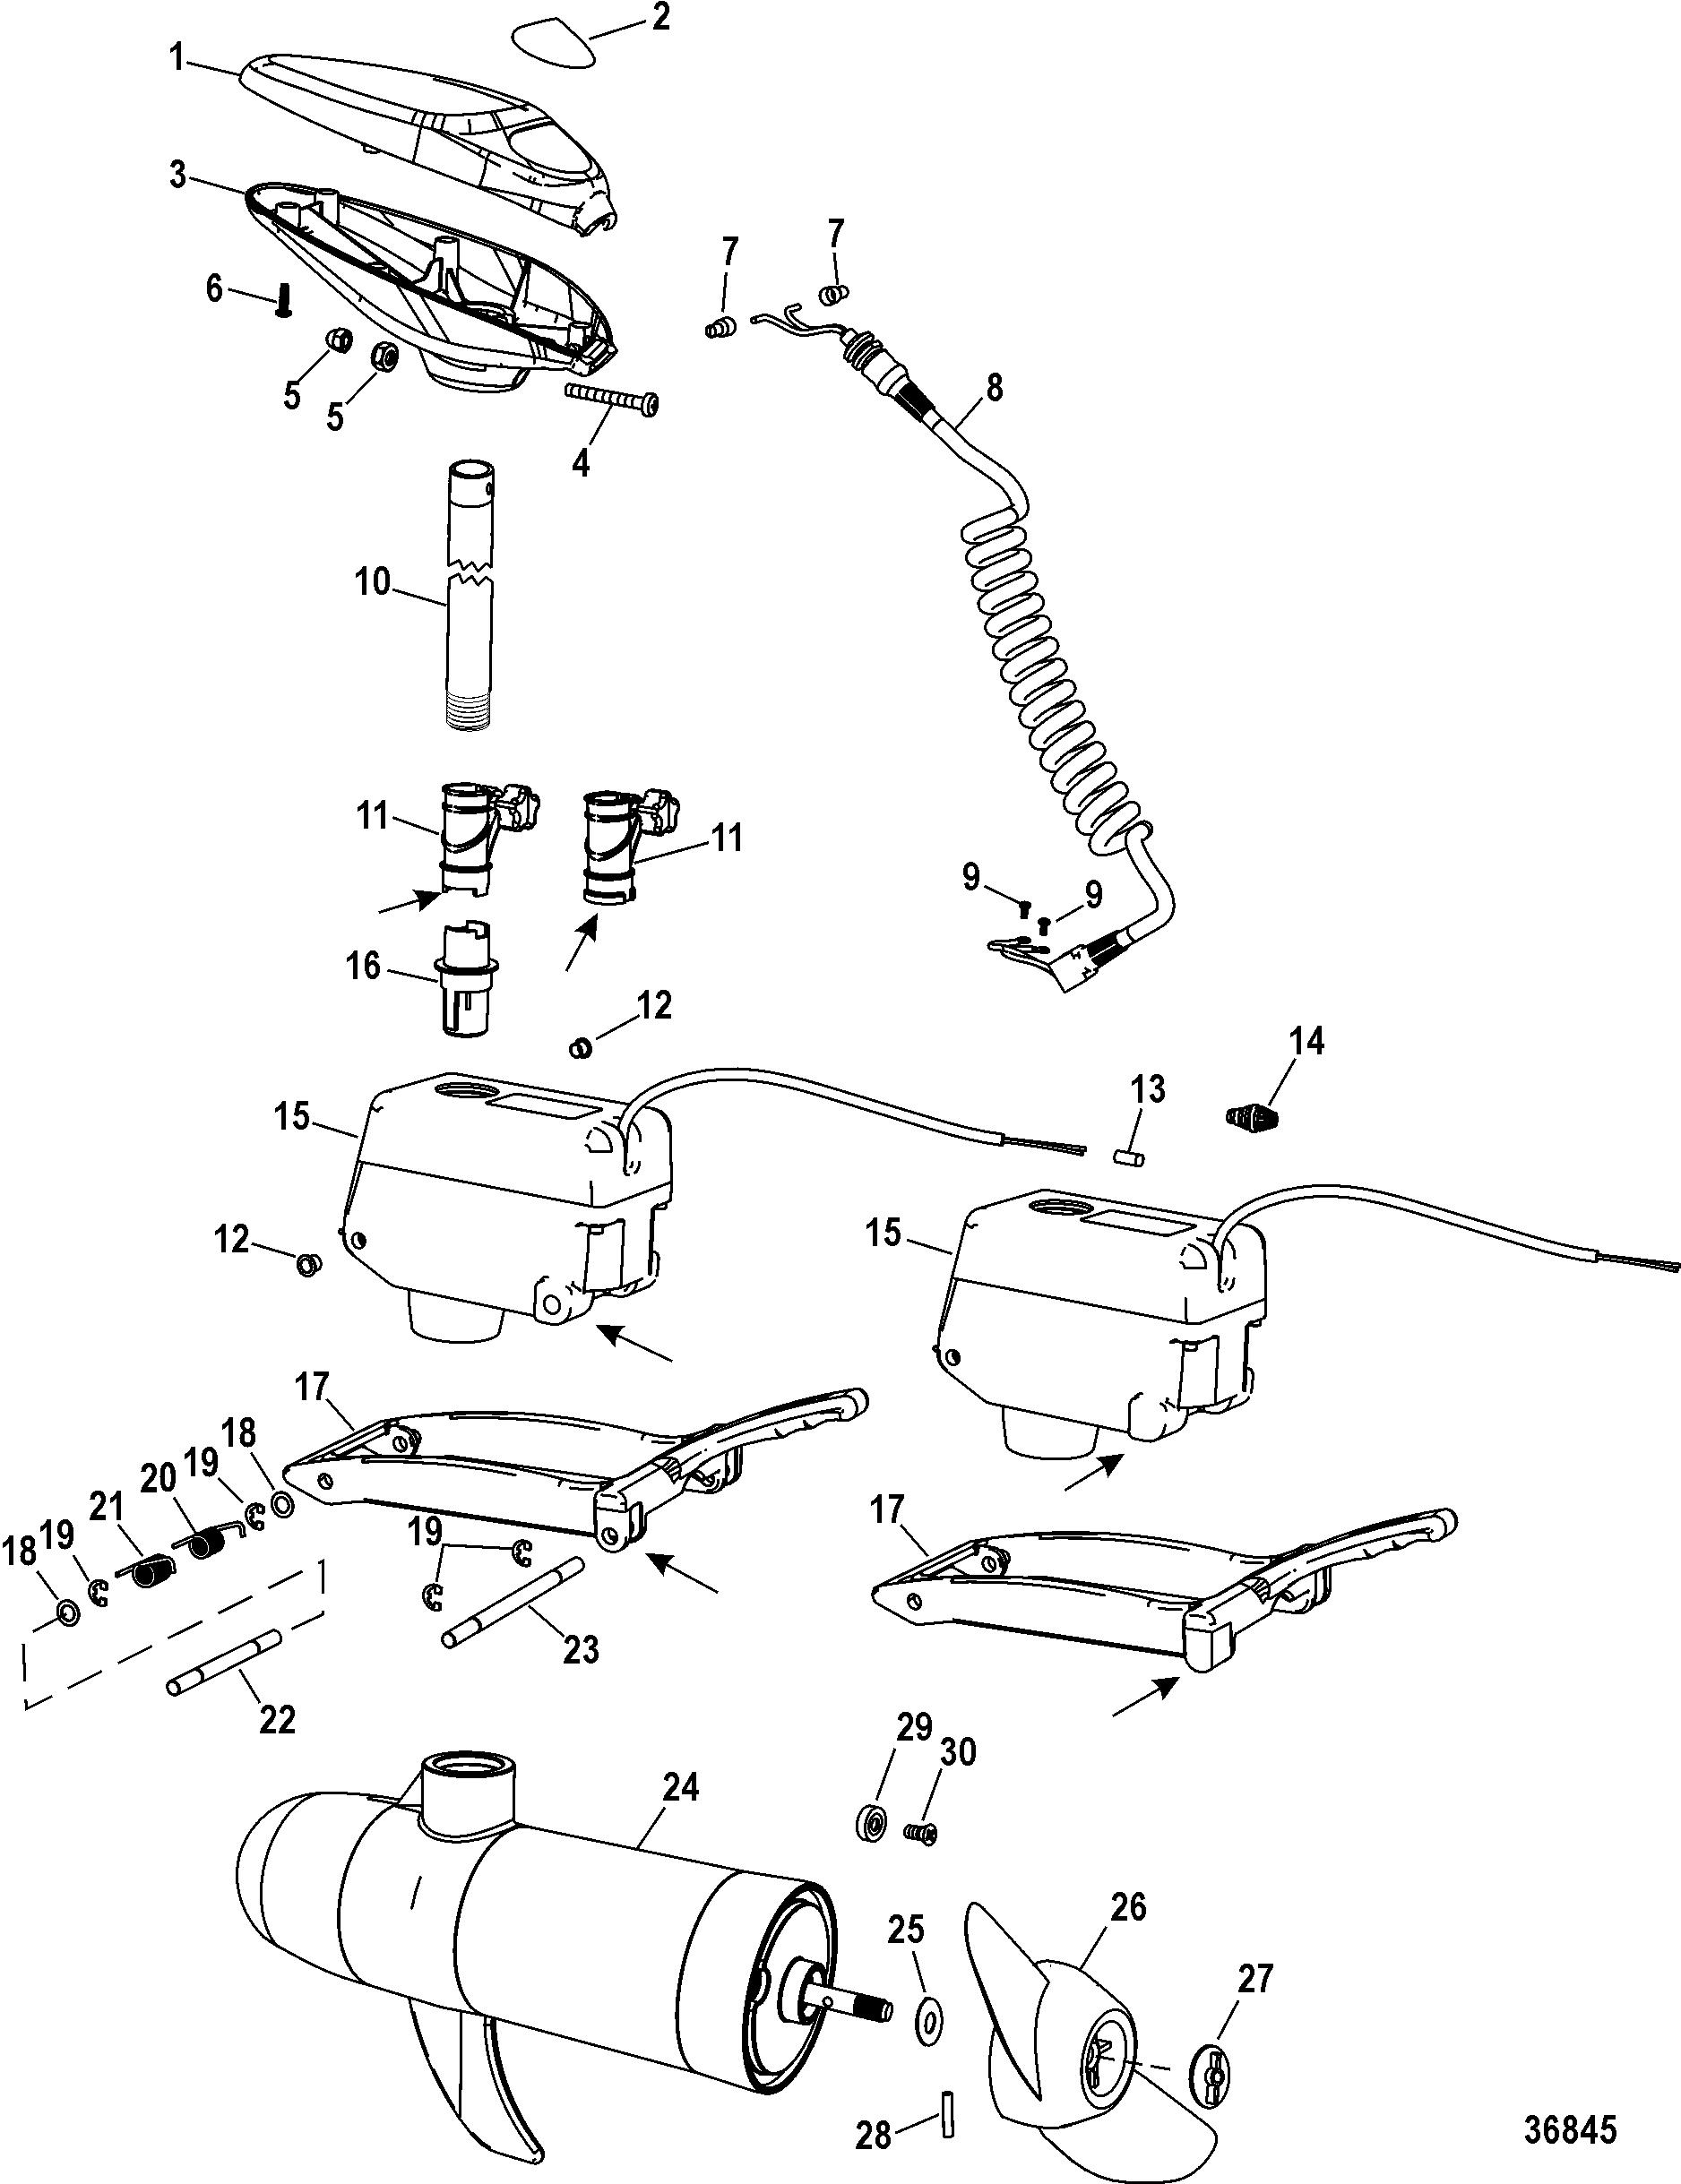 Motorguide Wireless Trolling Motor Owners Manual